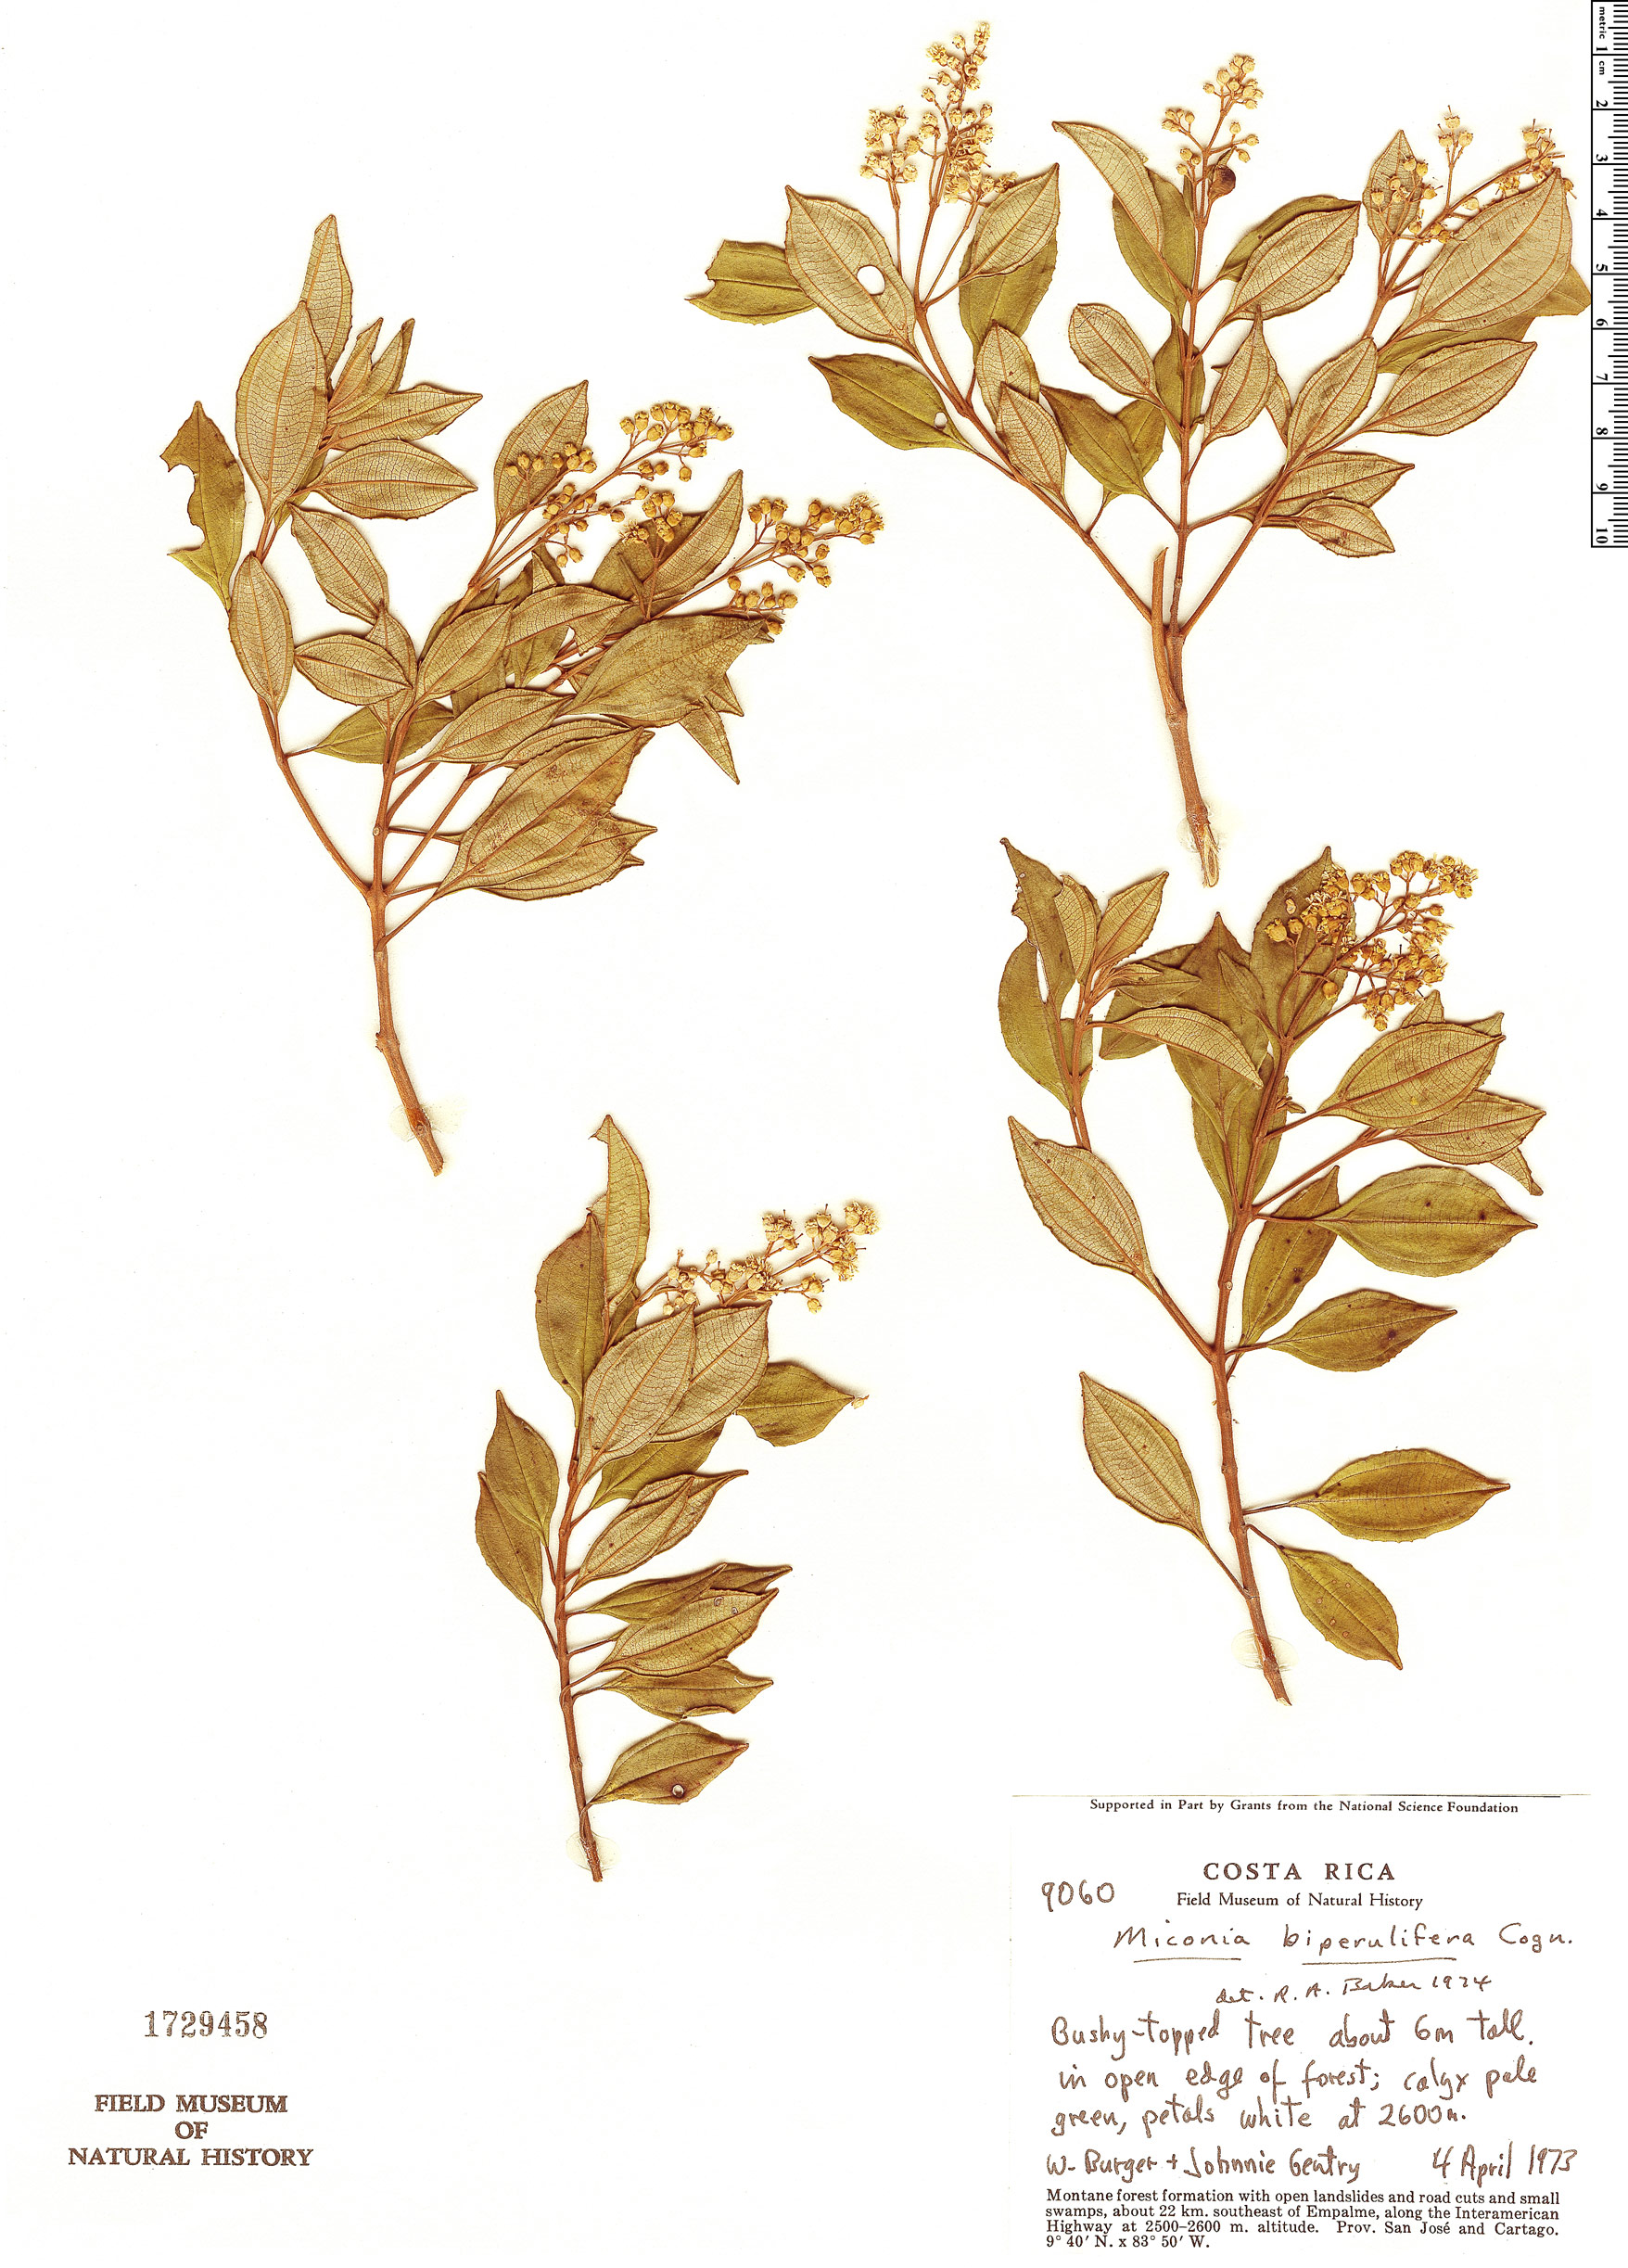 Specimen: Miconia biperulifera